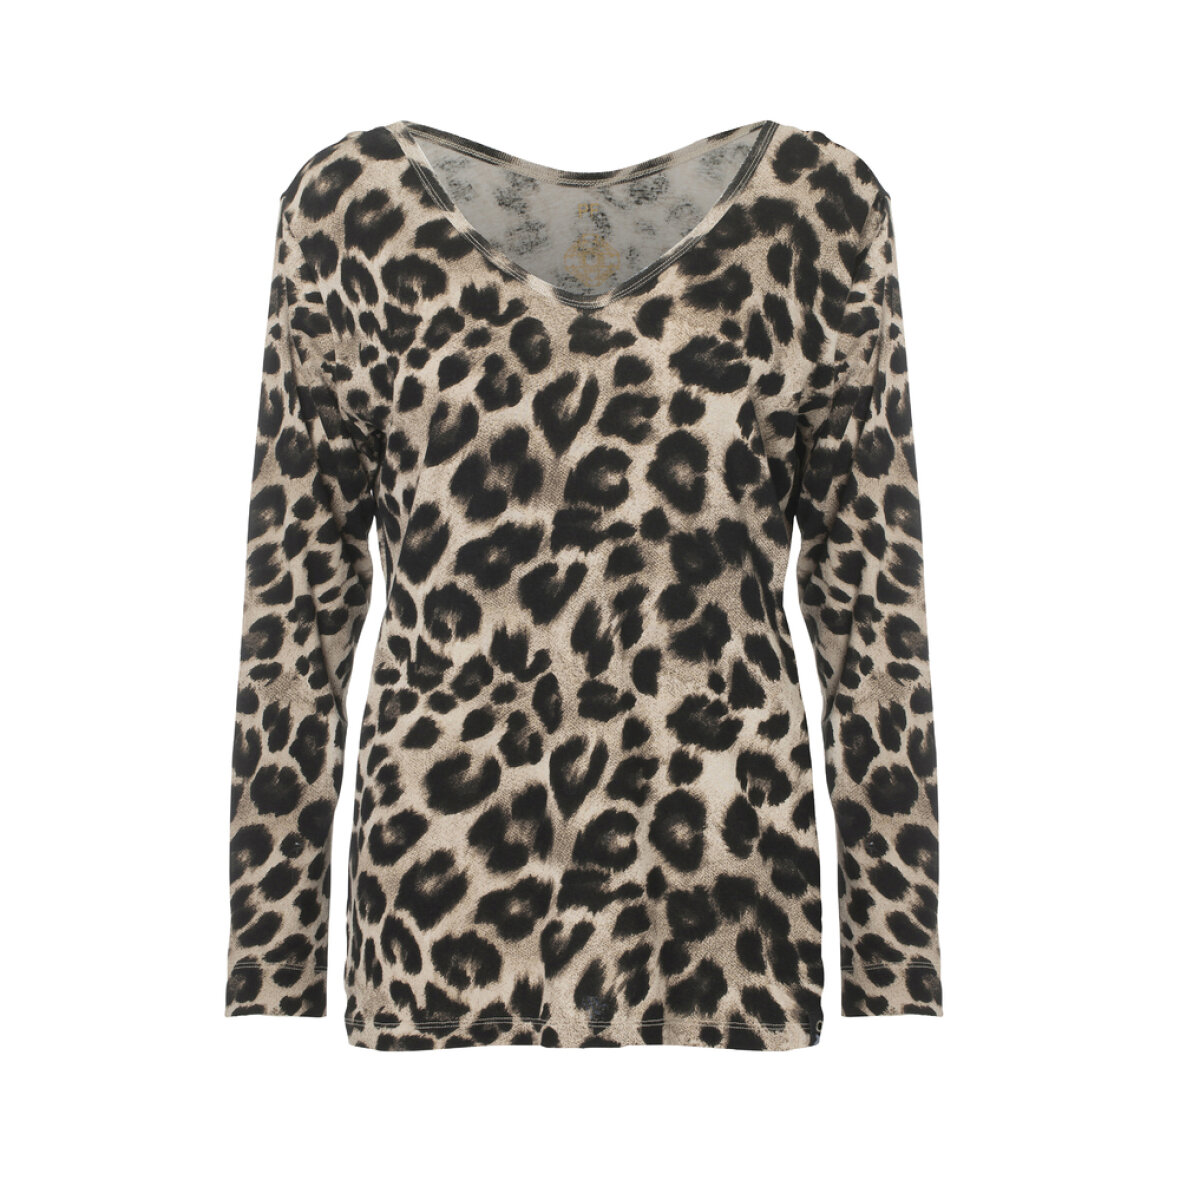 427738227c5a New York Aabenraa Bluse D - Fine Cph - Plus Fine Flore l s T-shirt